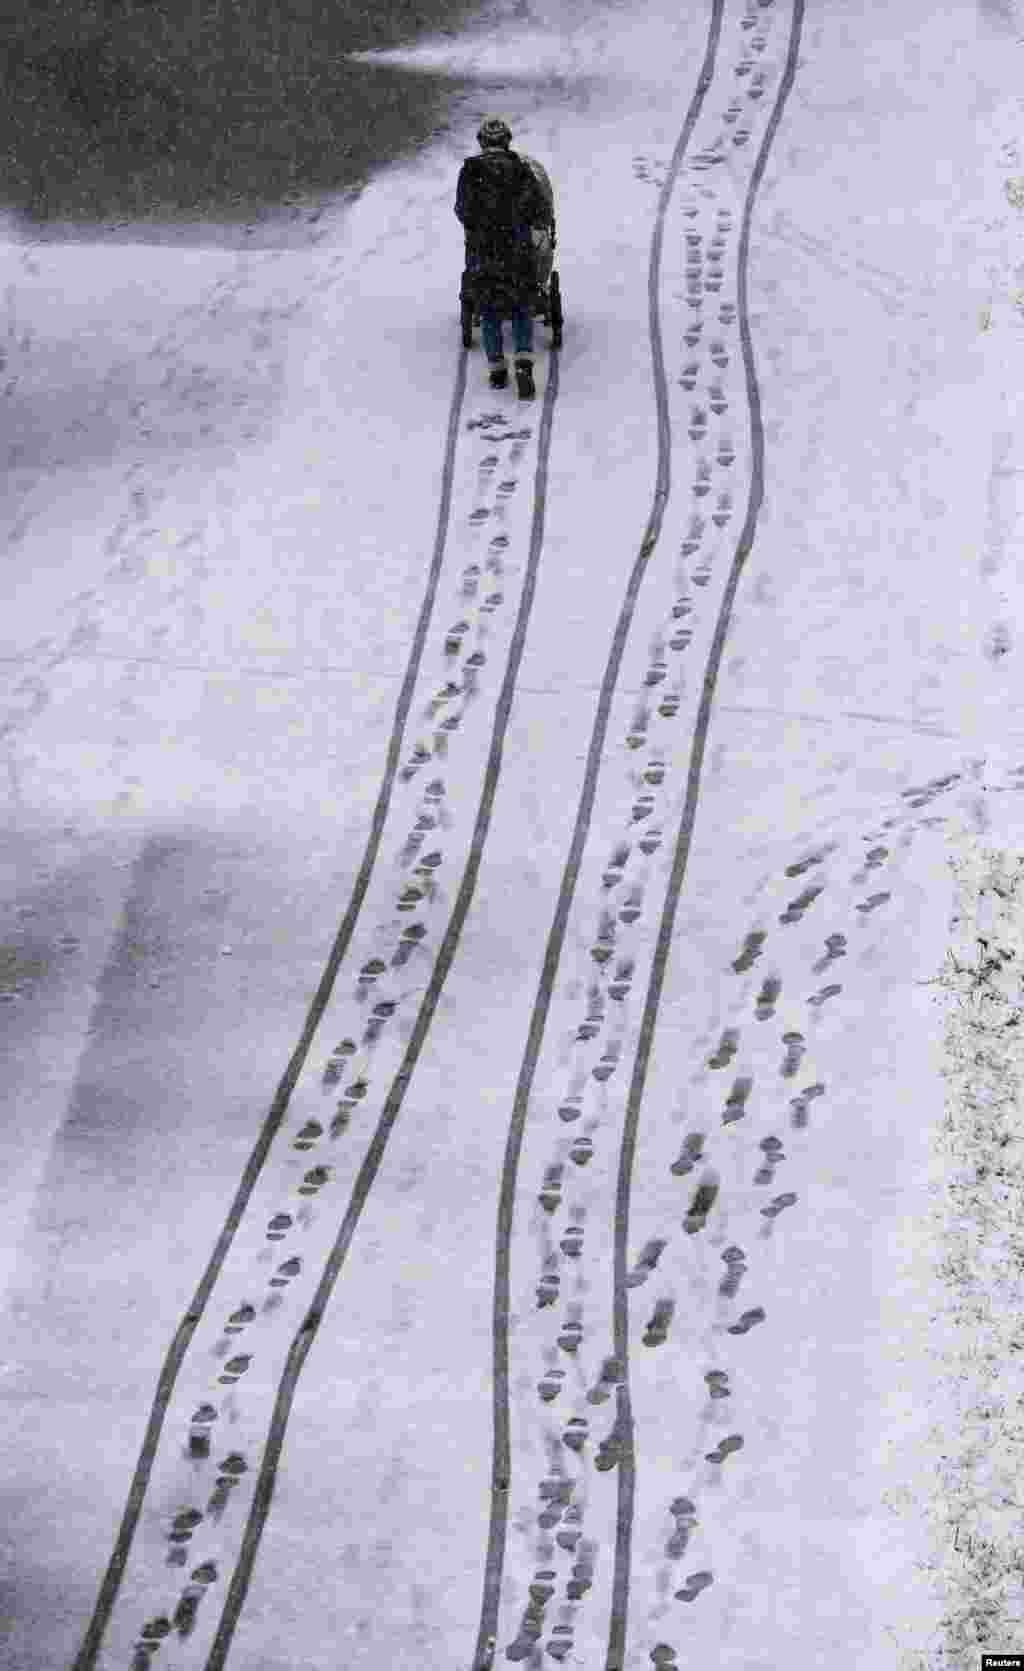 Seorang perempuan mendorong kereta bayi pada saat hujan salju lebat di kota Krasnoyarsk, Siberia, Rusia.